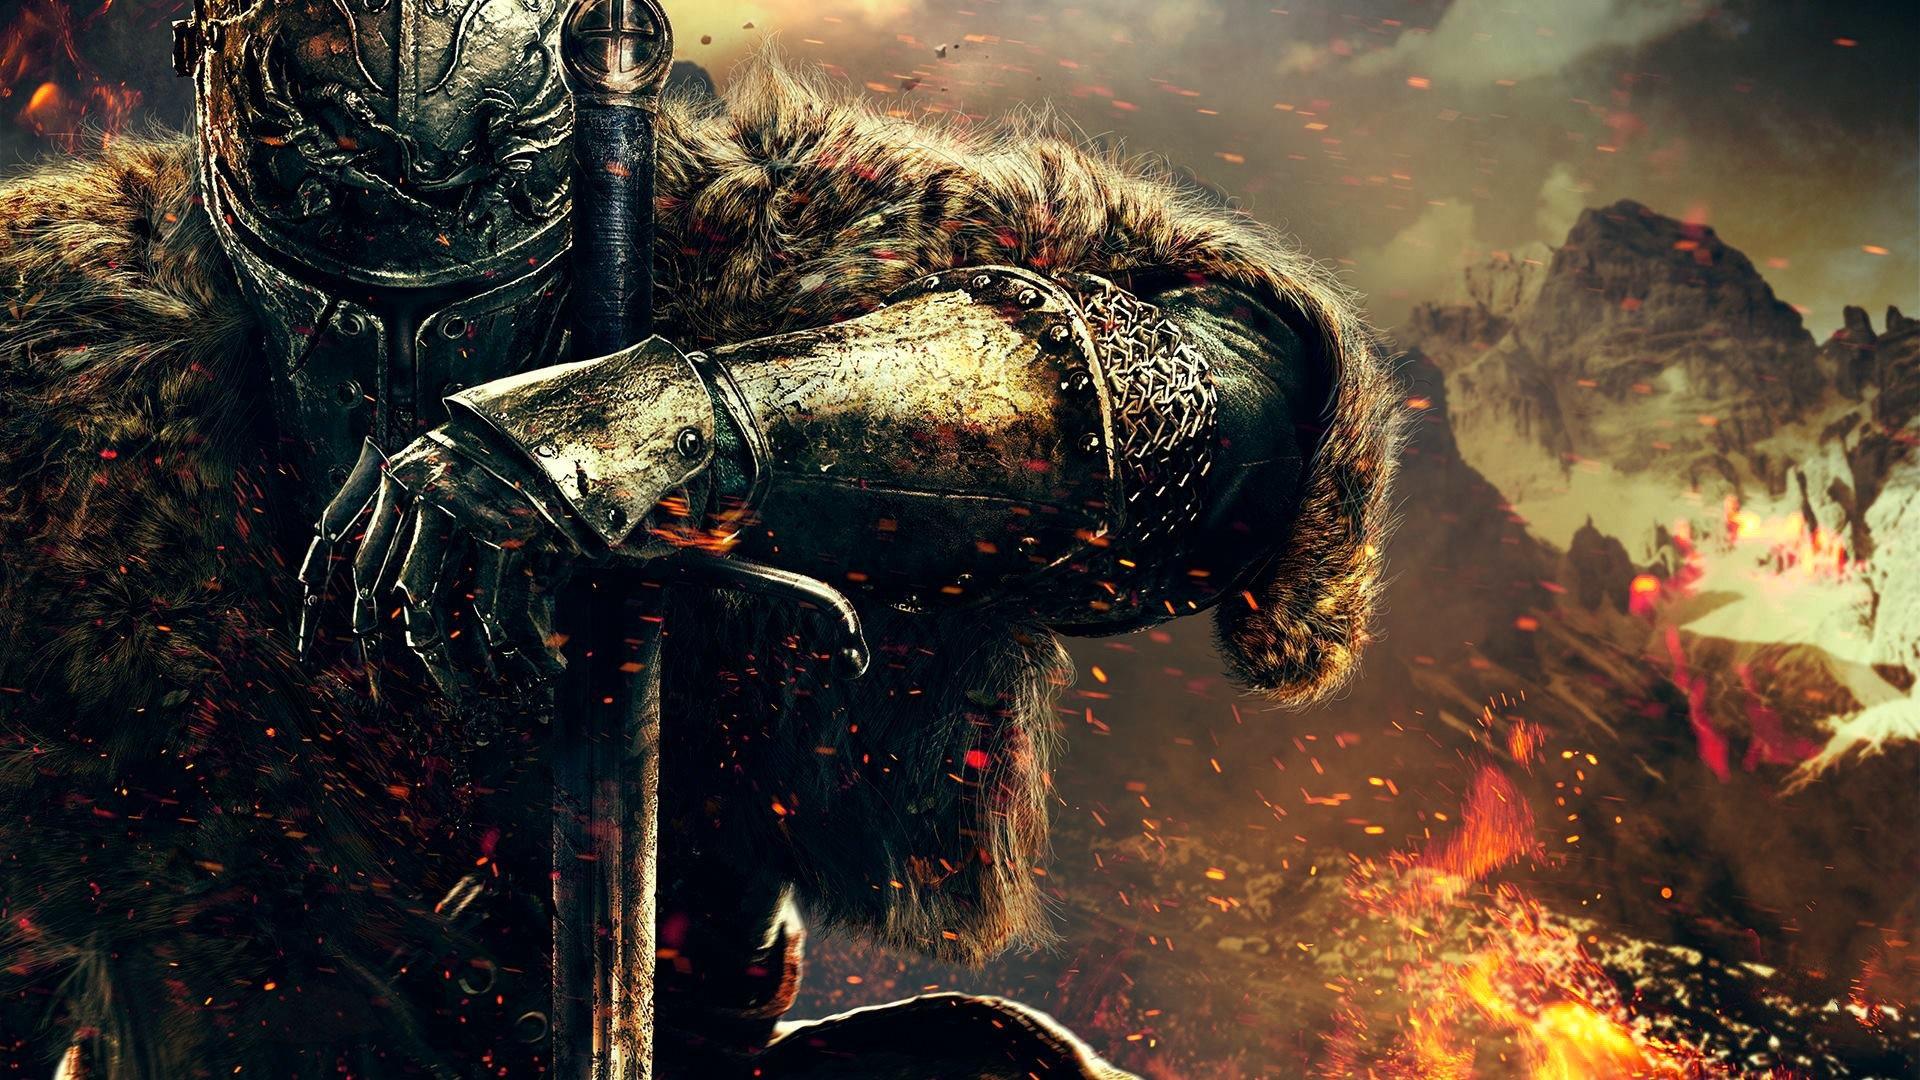 54 Dark Souls II HD Wallpapers | Backgrounds - Wallpaper Abyss